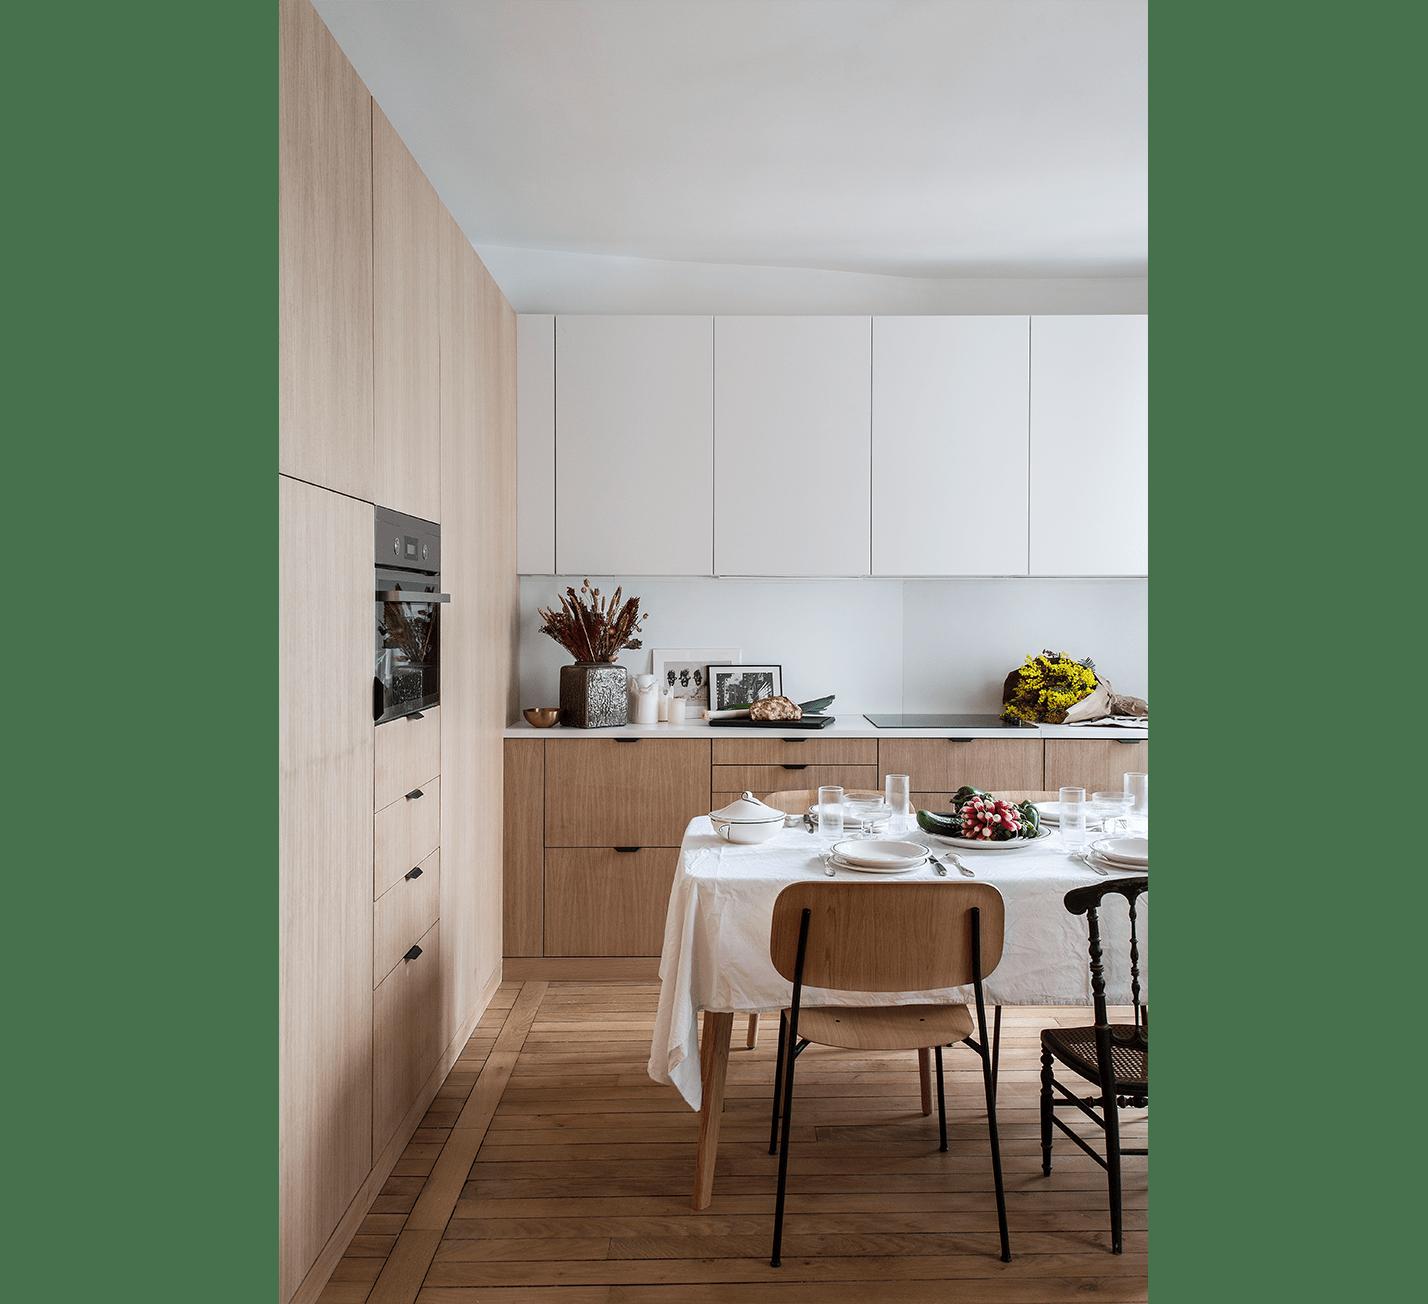 Projet-Cavallotti-Atelier-Steve-Pauline-Borgia-Architecte-interieur-02-min